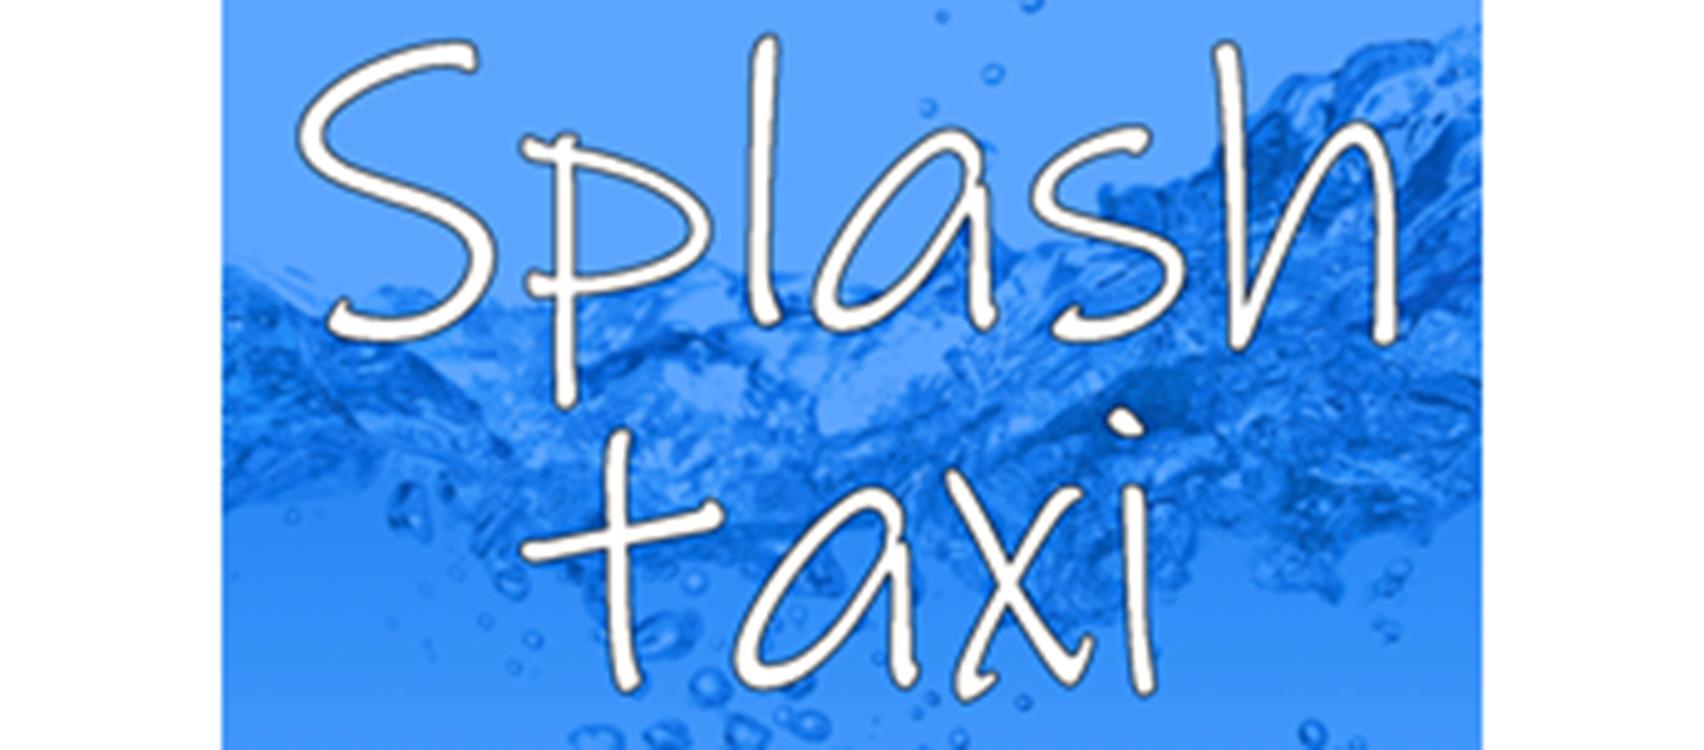 Splash Taxi  (Україна)